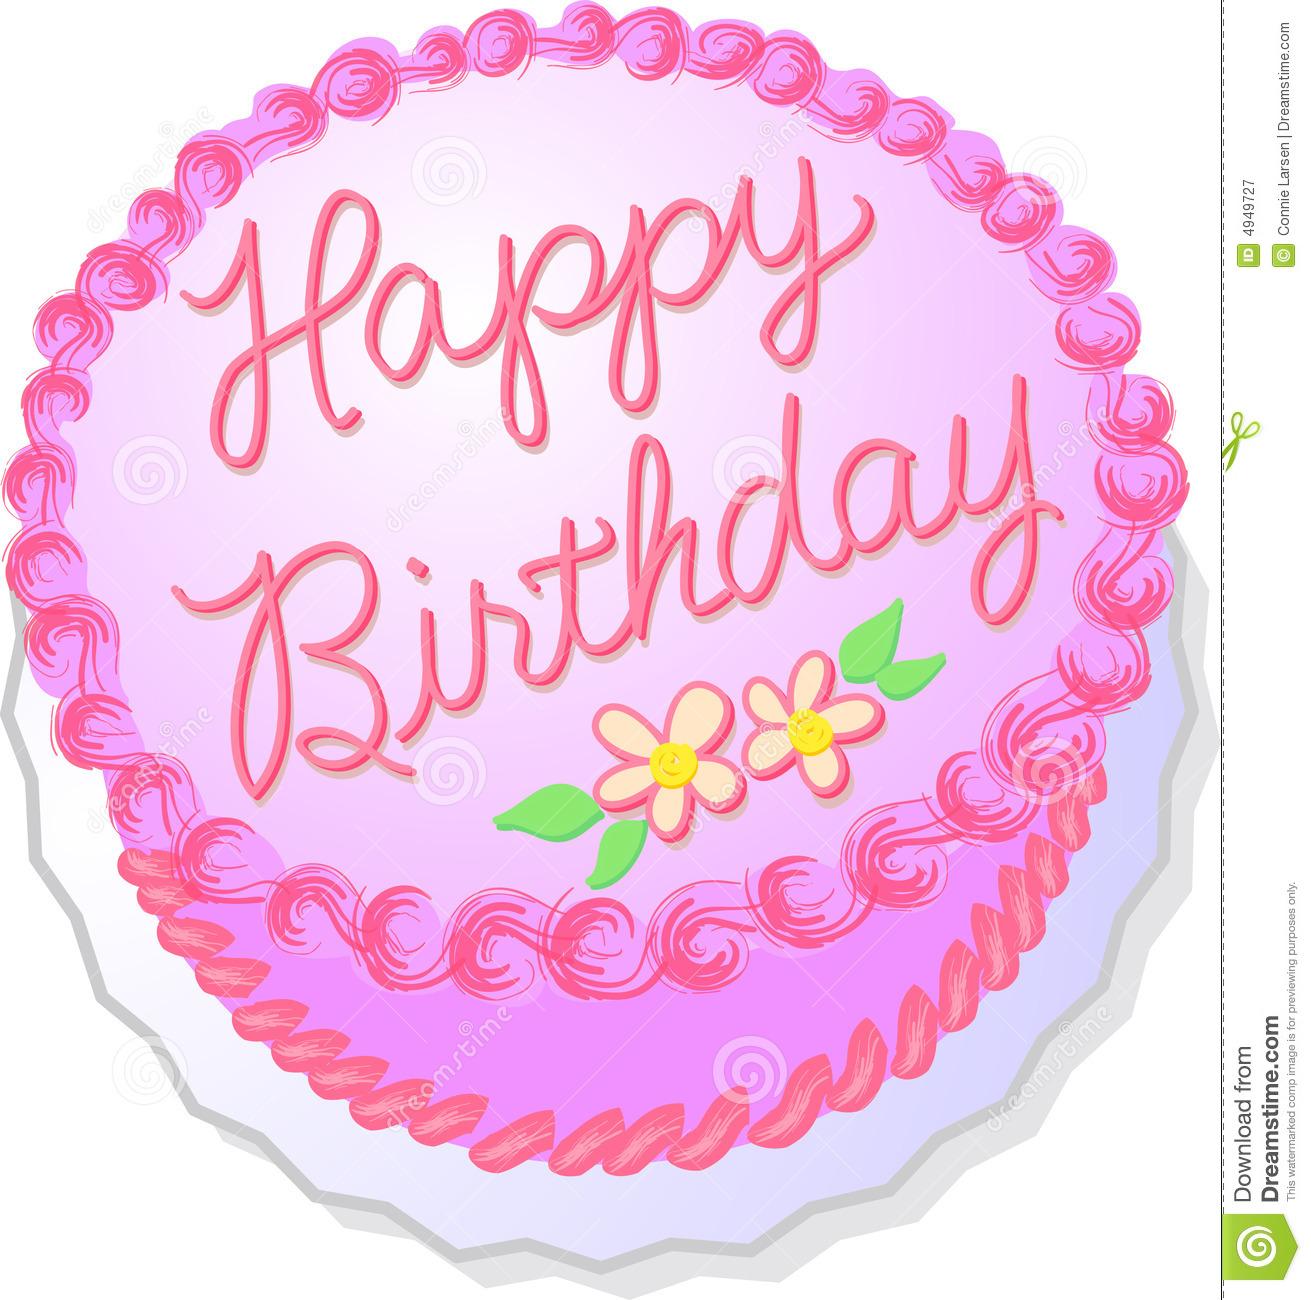 Computer birthday cake clipart banner royalty free stock Free Birthday Cake : Katinabags.com banner royalty free stock